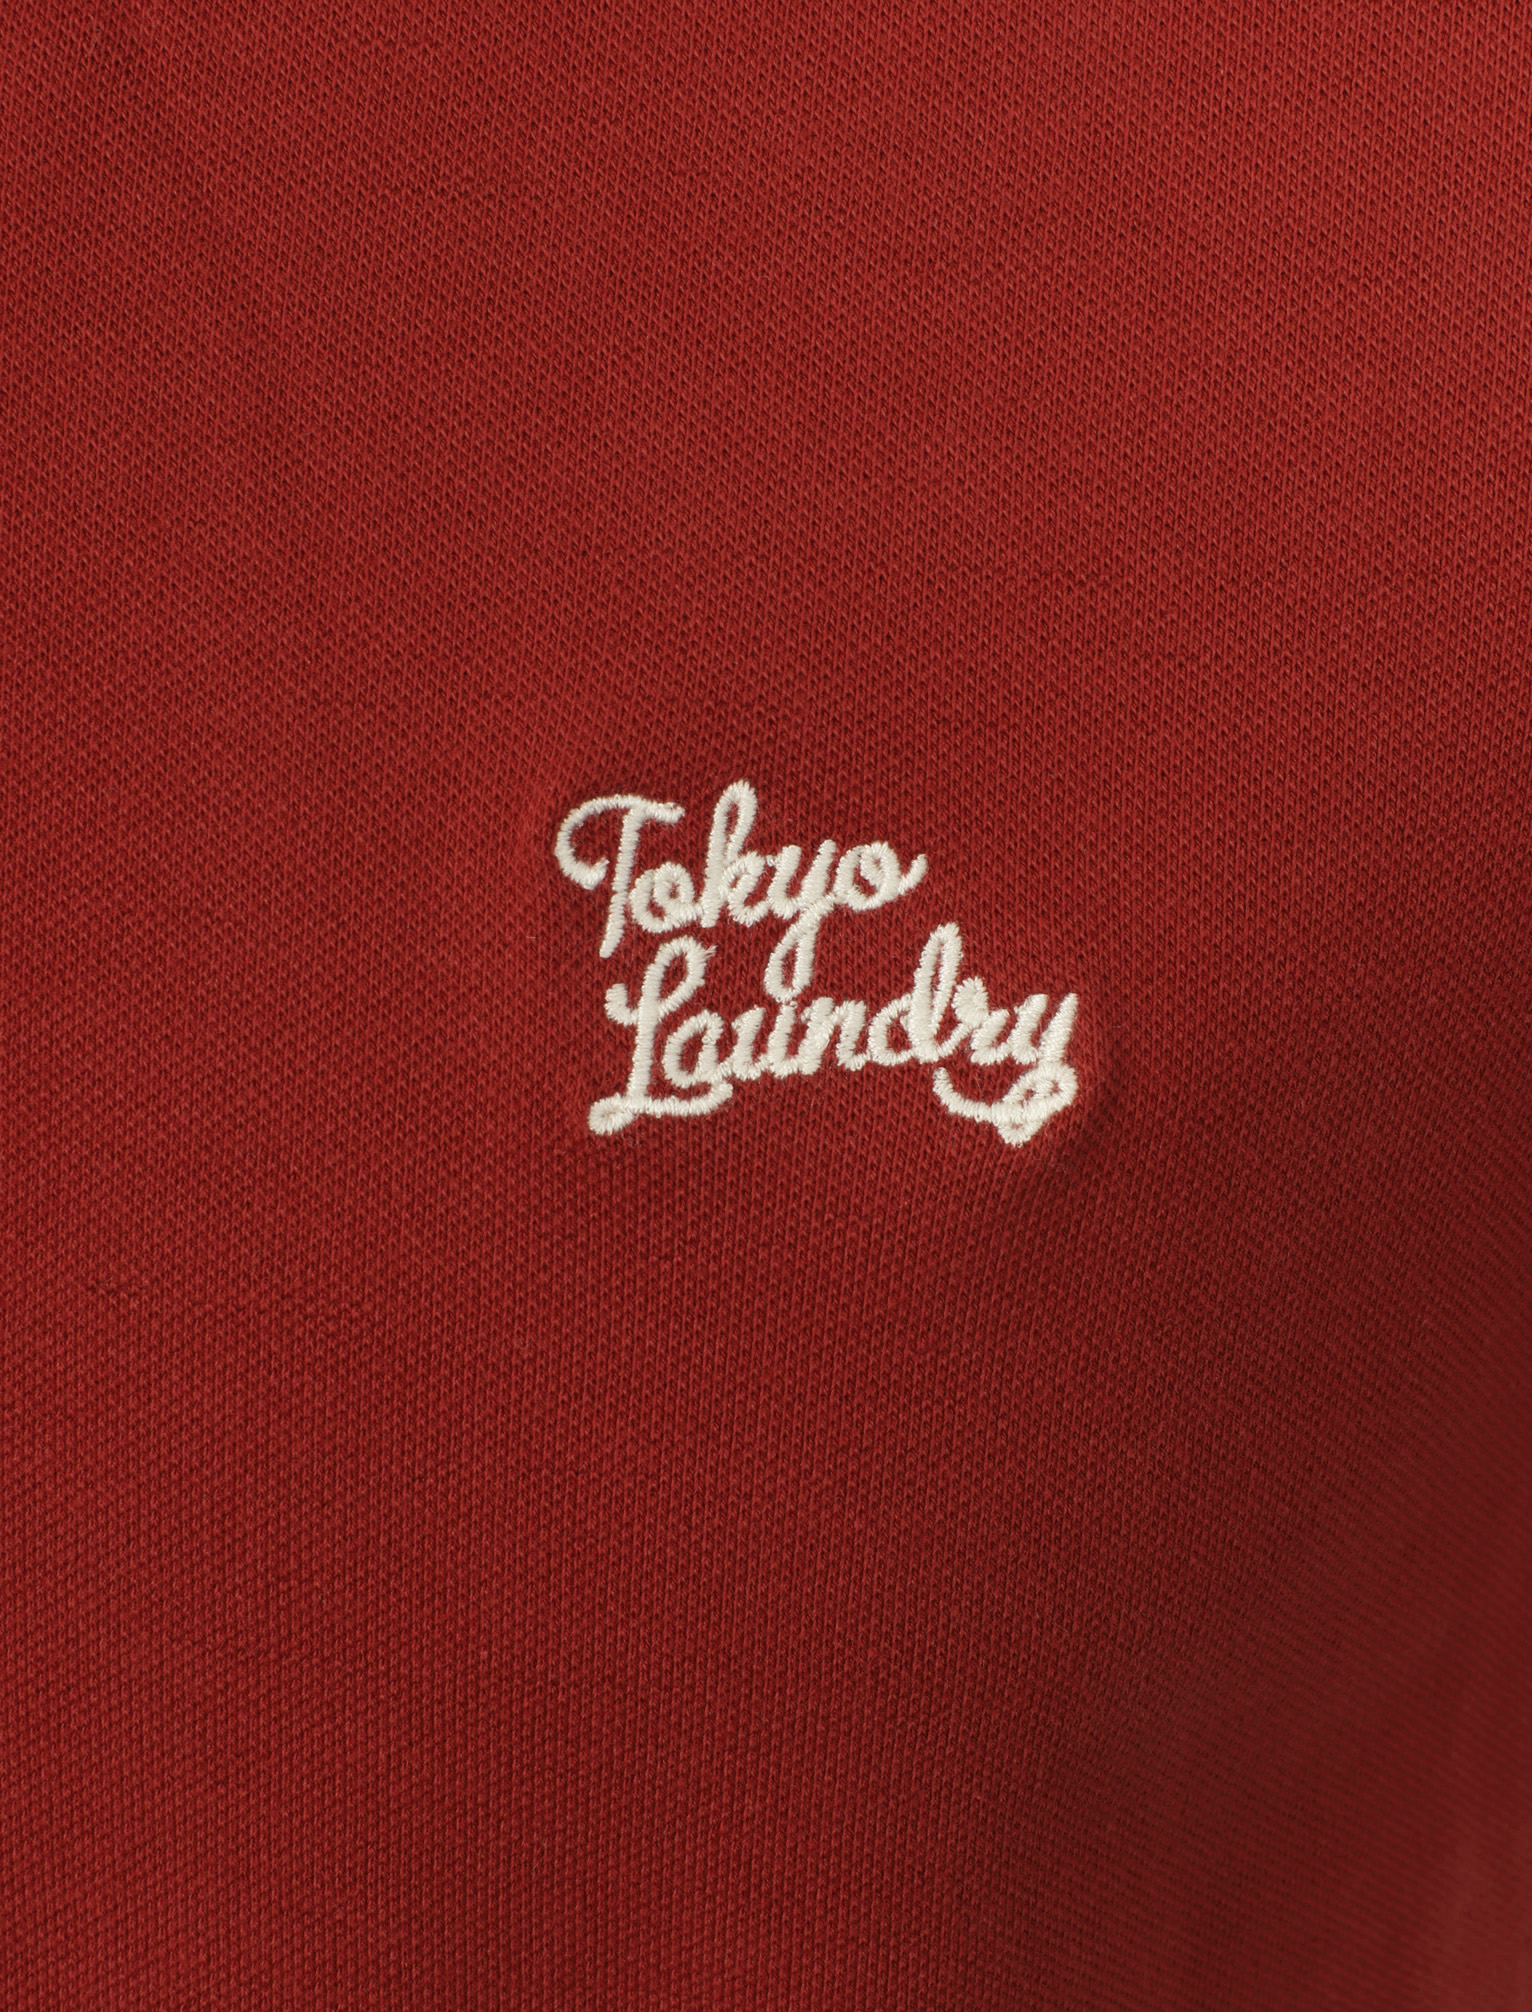 New-Mens-Tokyo-Laundry-Branded-Kuusamo-Cotton-Rich-Pique-Polo-Shirt-Size-S-XXL thumbnail 32